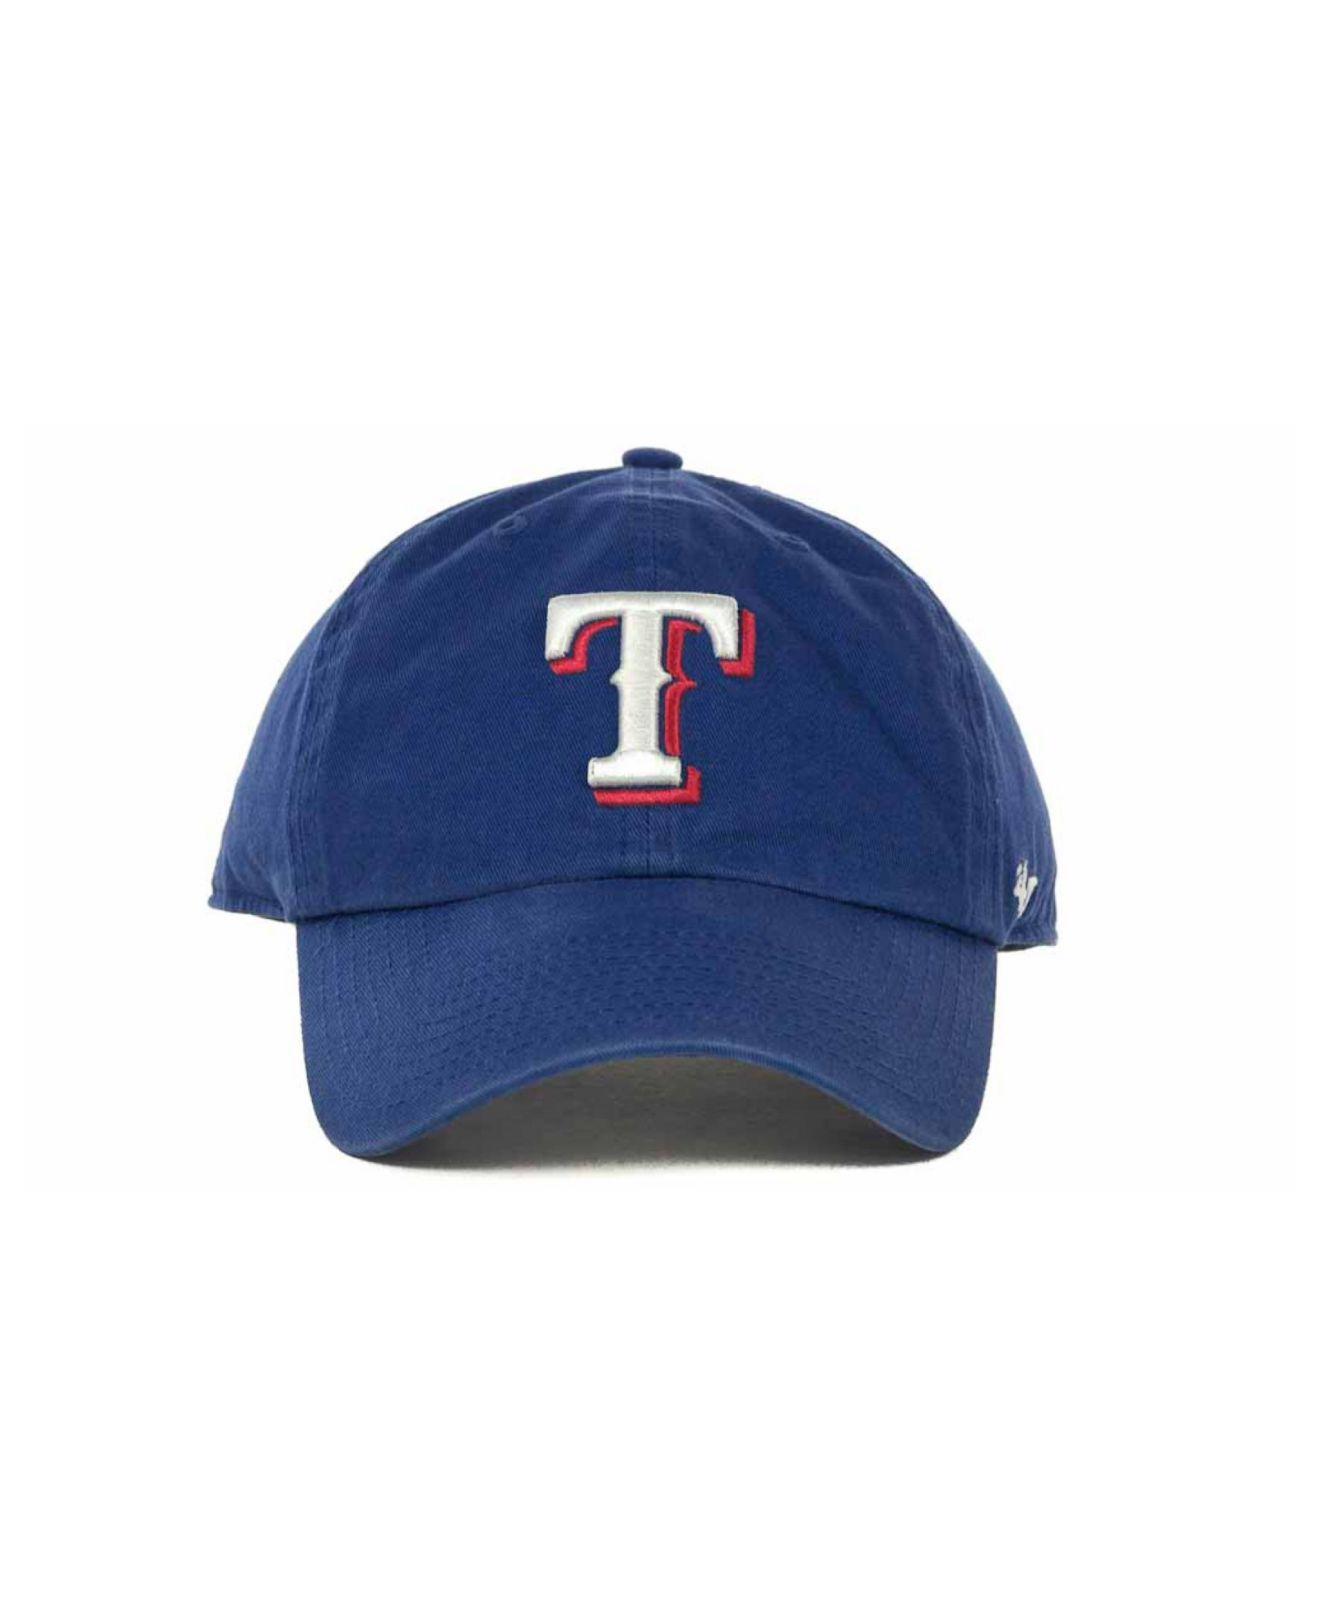 best loved 024e5 d65e9 Lyst - 47 Brand Texas Rangers Clean Up Hat in Blue for Men